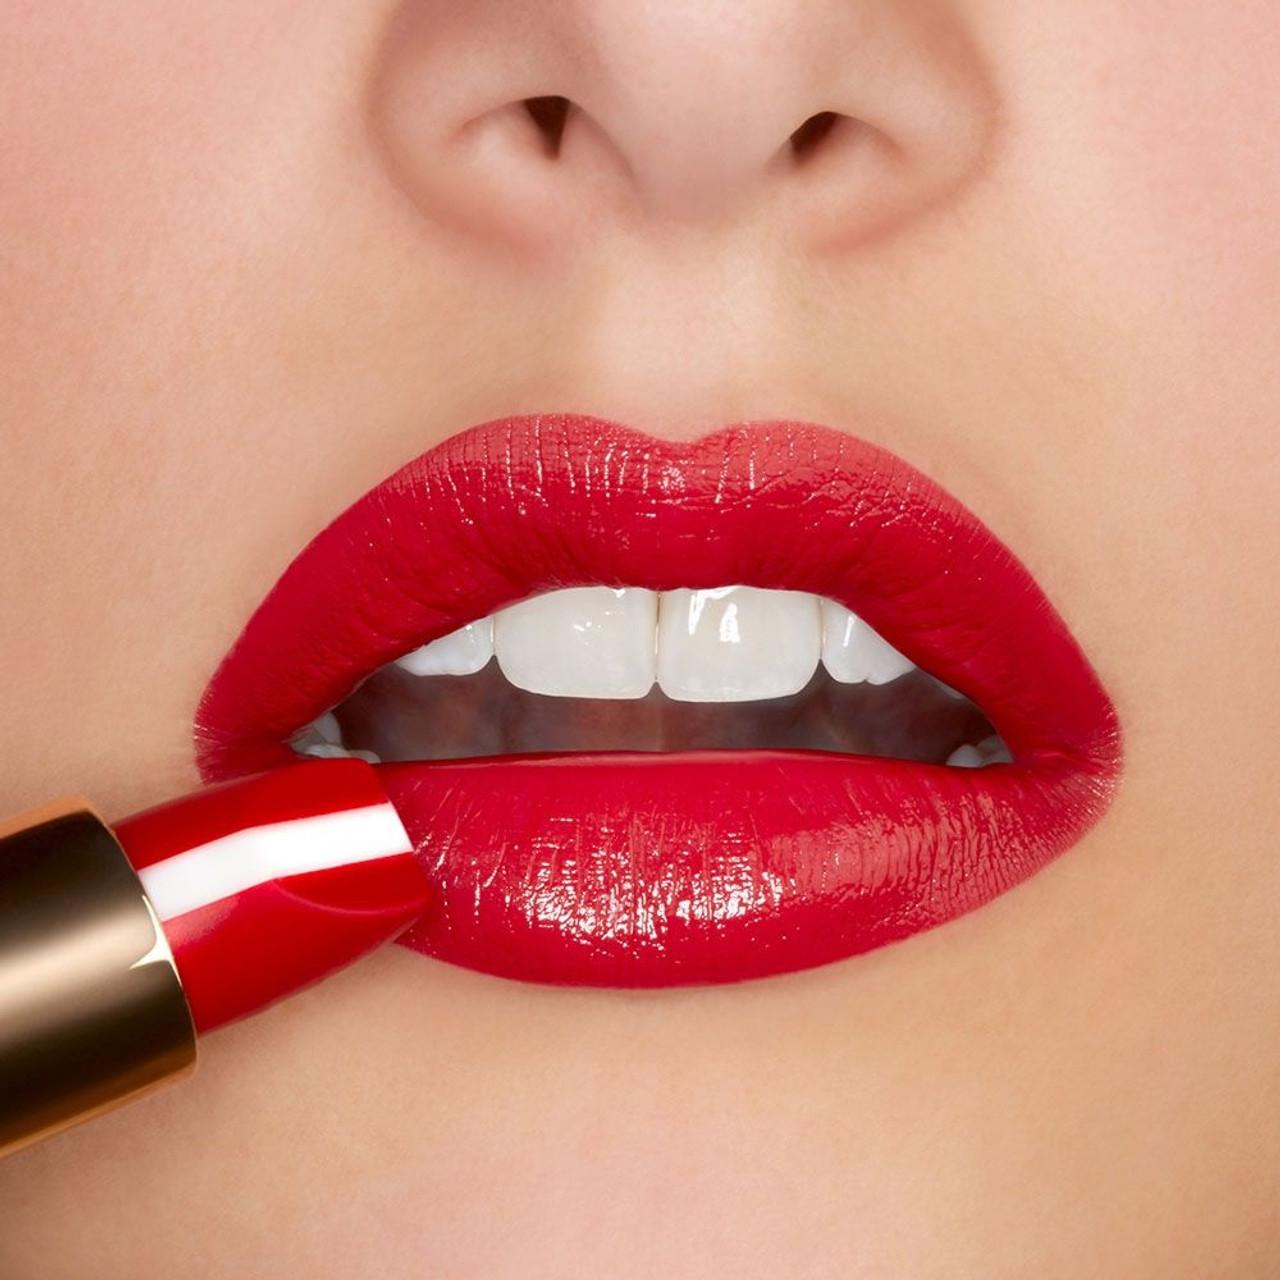 Grande Cosmetics Plumping Lipstick - Dulce De Leche